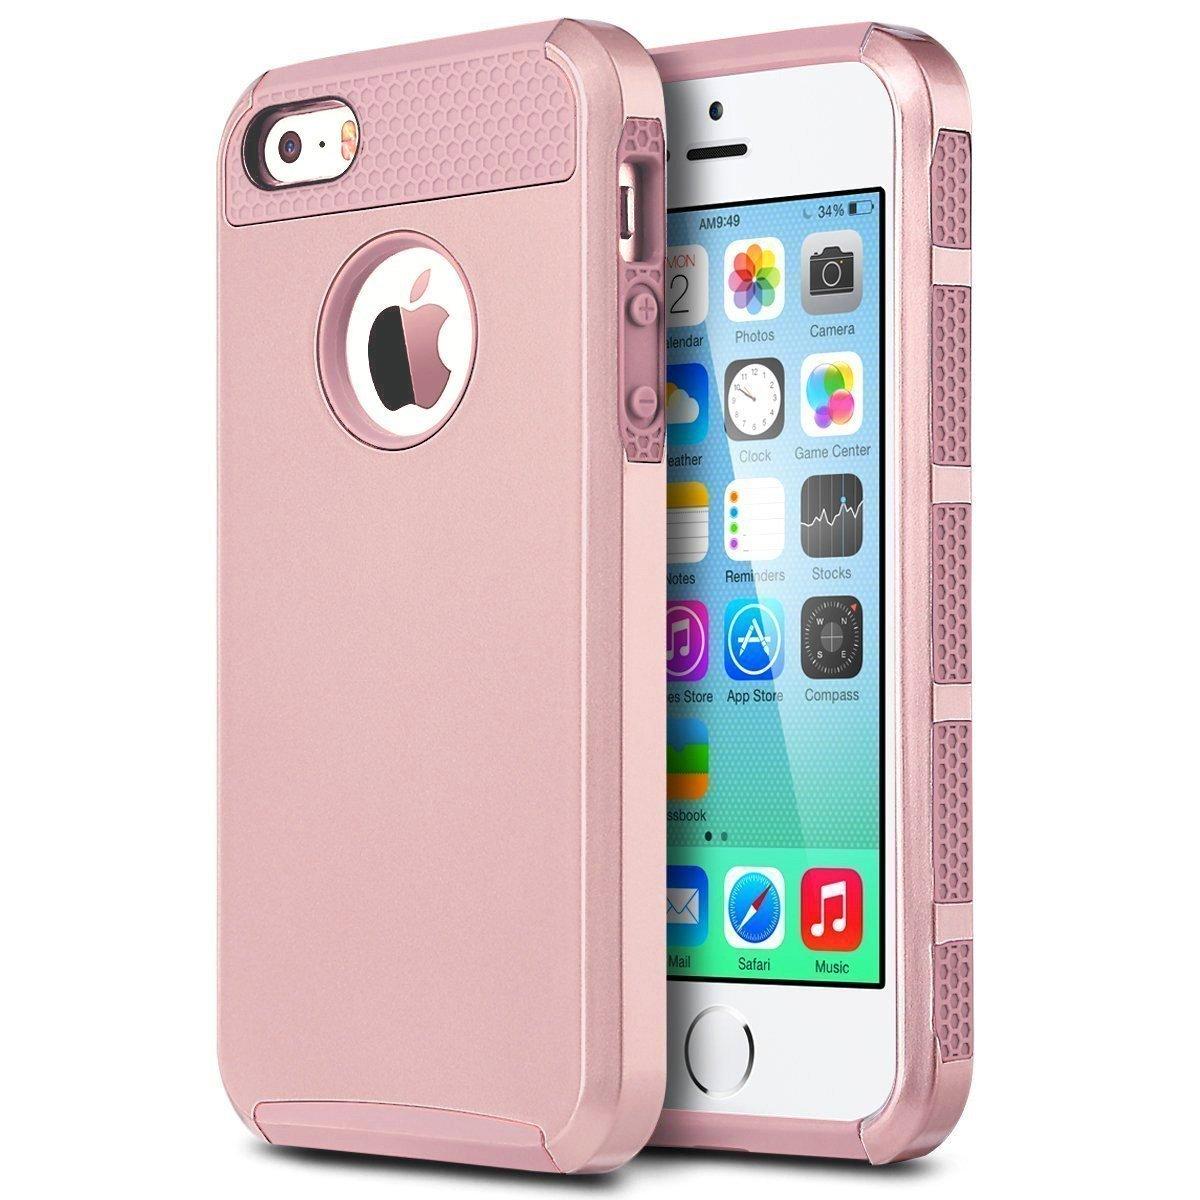 glitter iphone 6 cases for girls. Black Bedroom Furniture Sets. Home Design Ideas